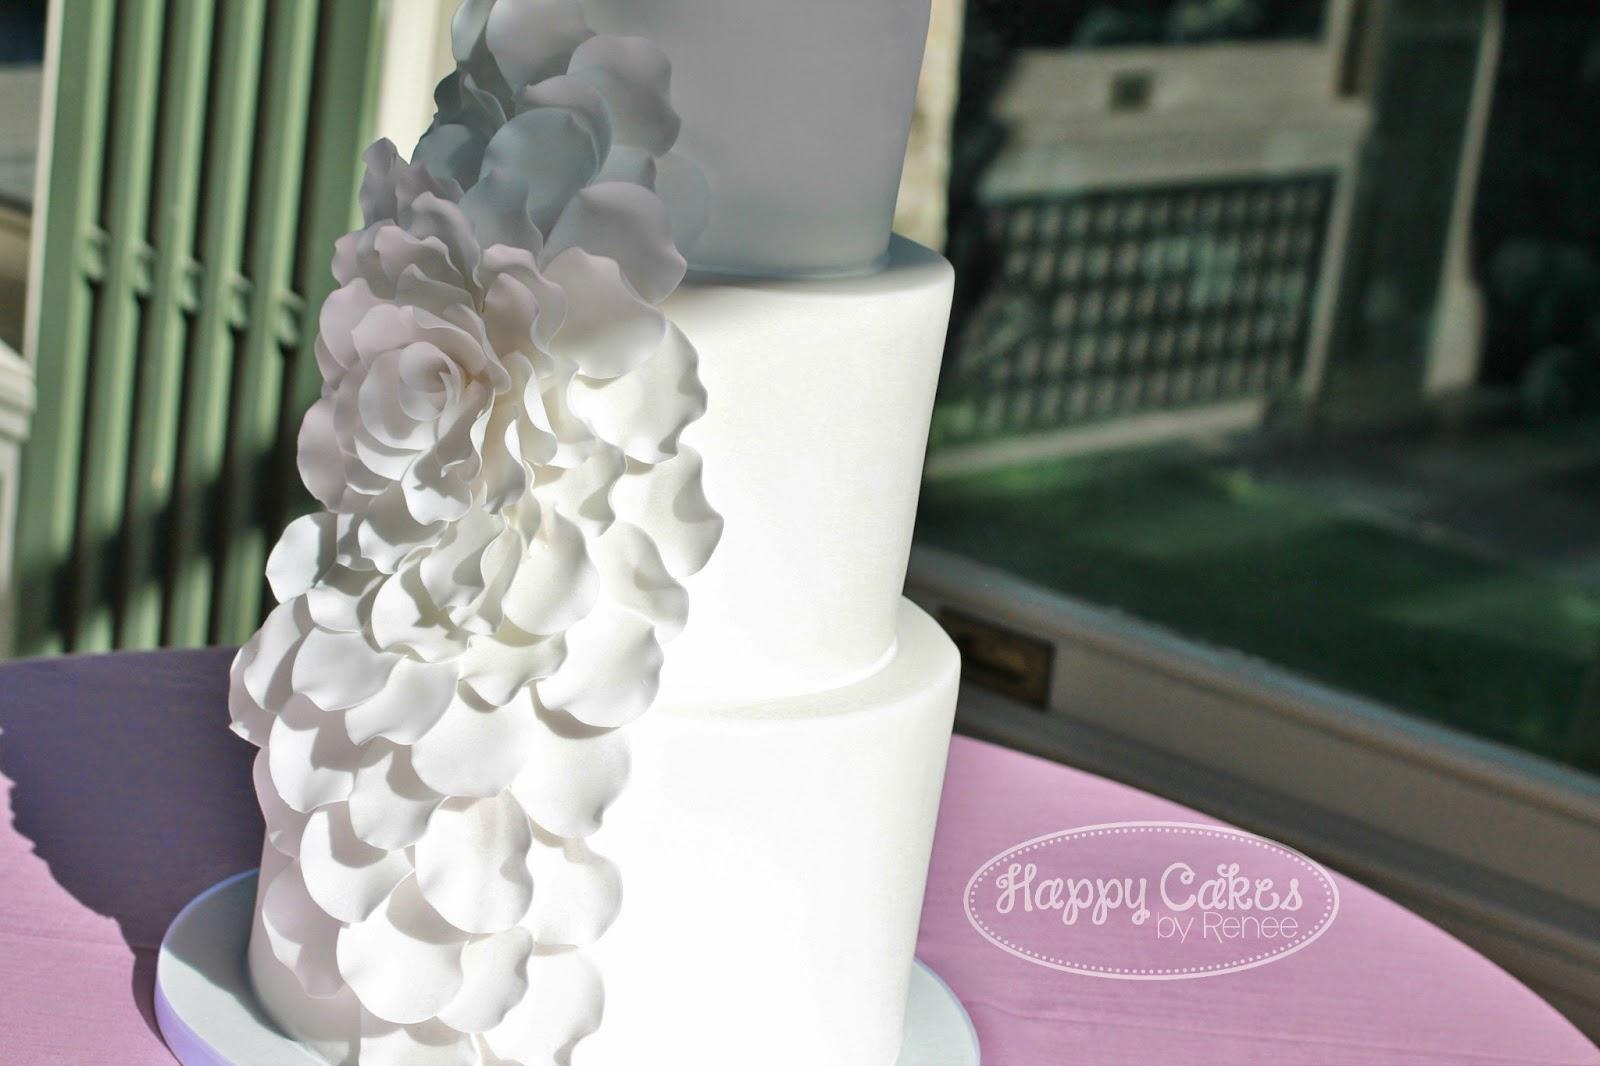 Renee – Page 5 – Renee Conner Cake Design